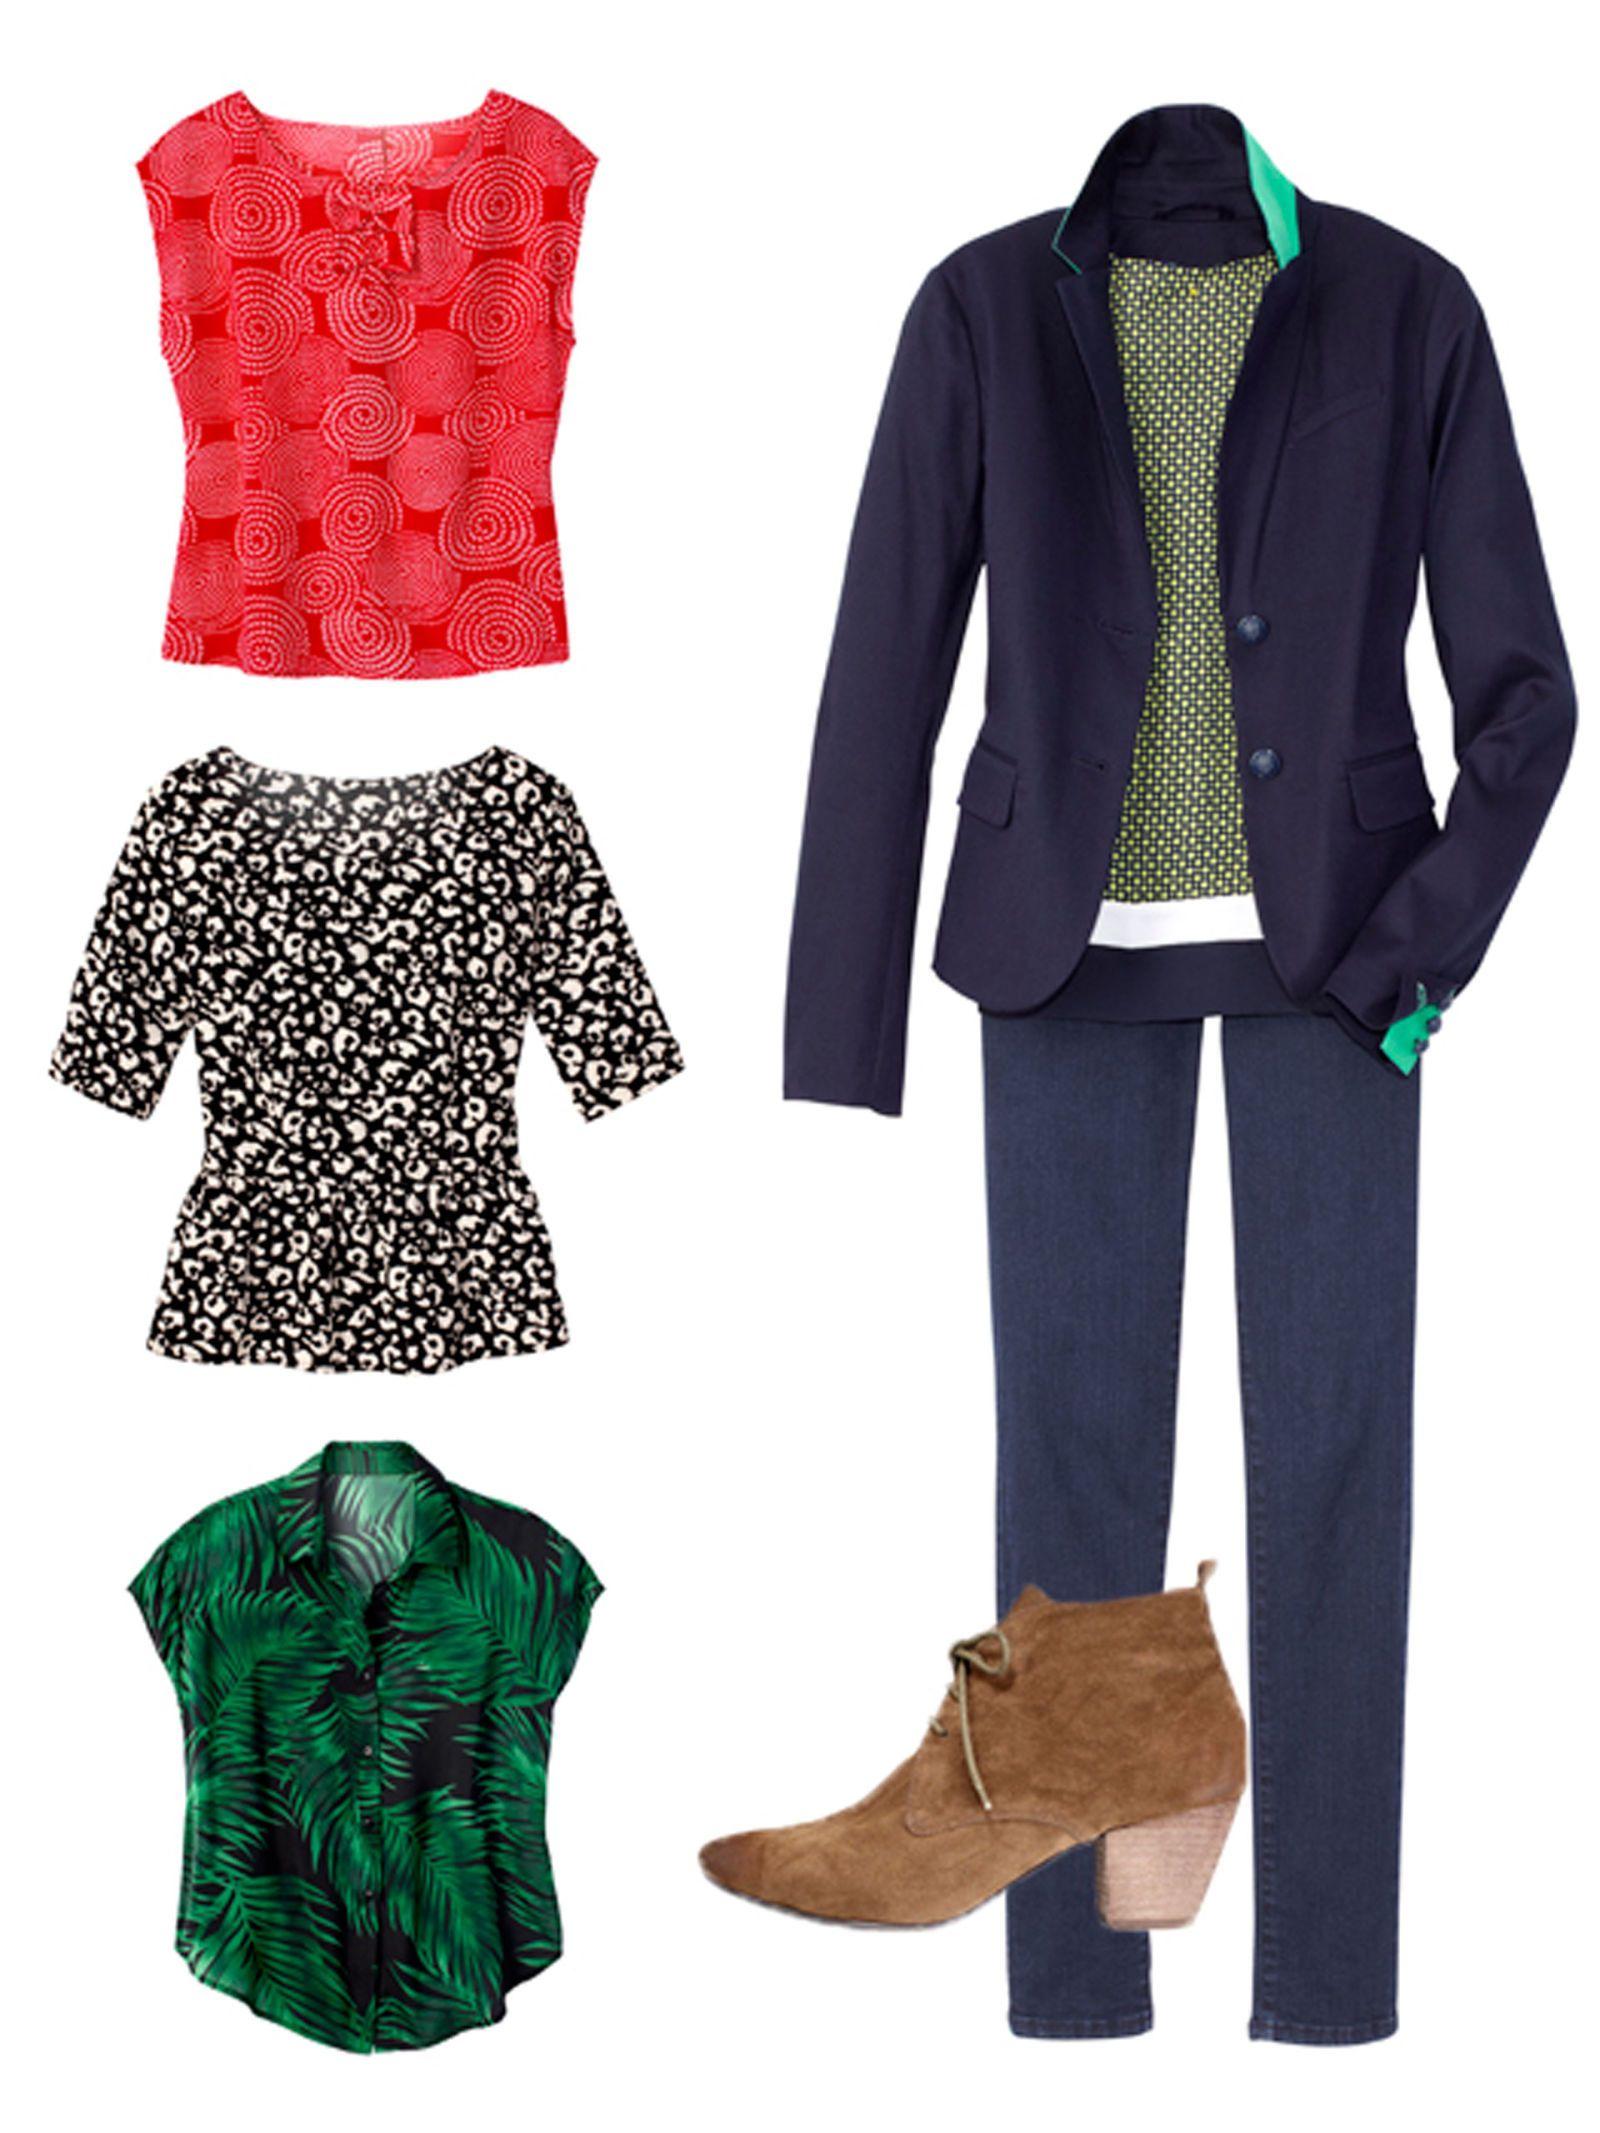 heidi klum fashion tips